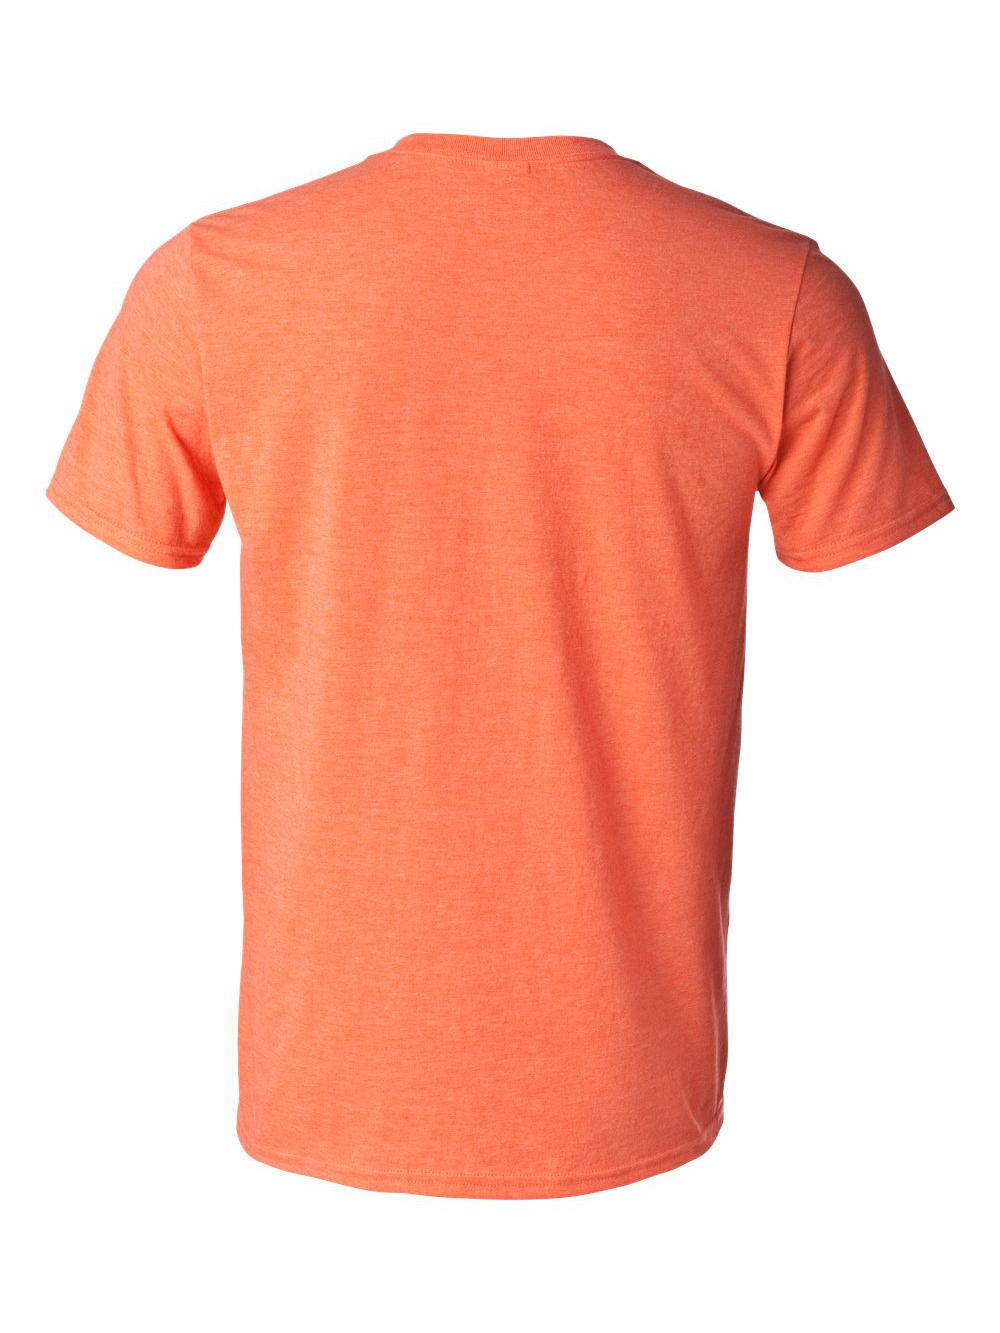 Gildan-Softstyle-T-Shirt-64000 thumbnail 88